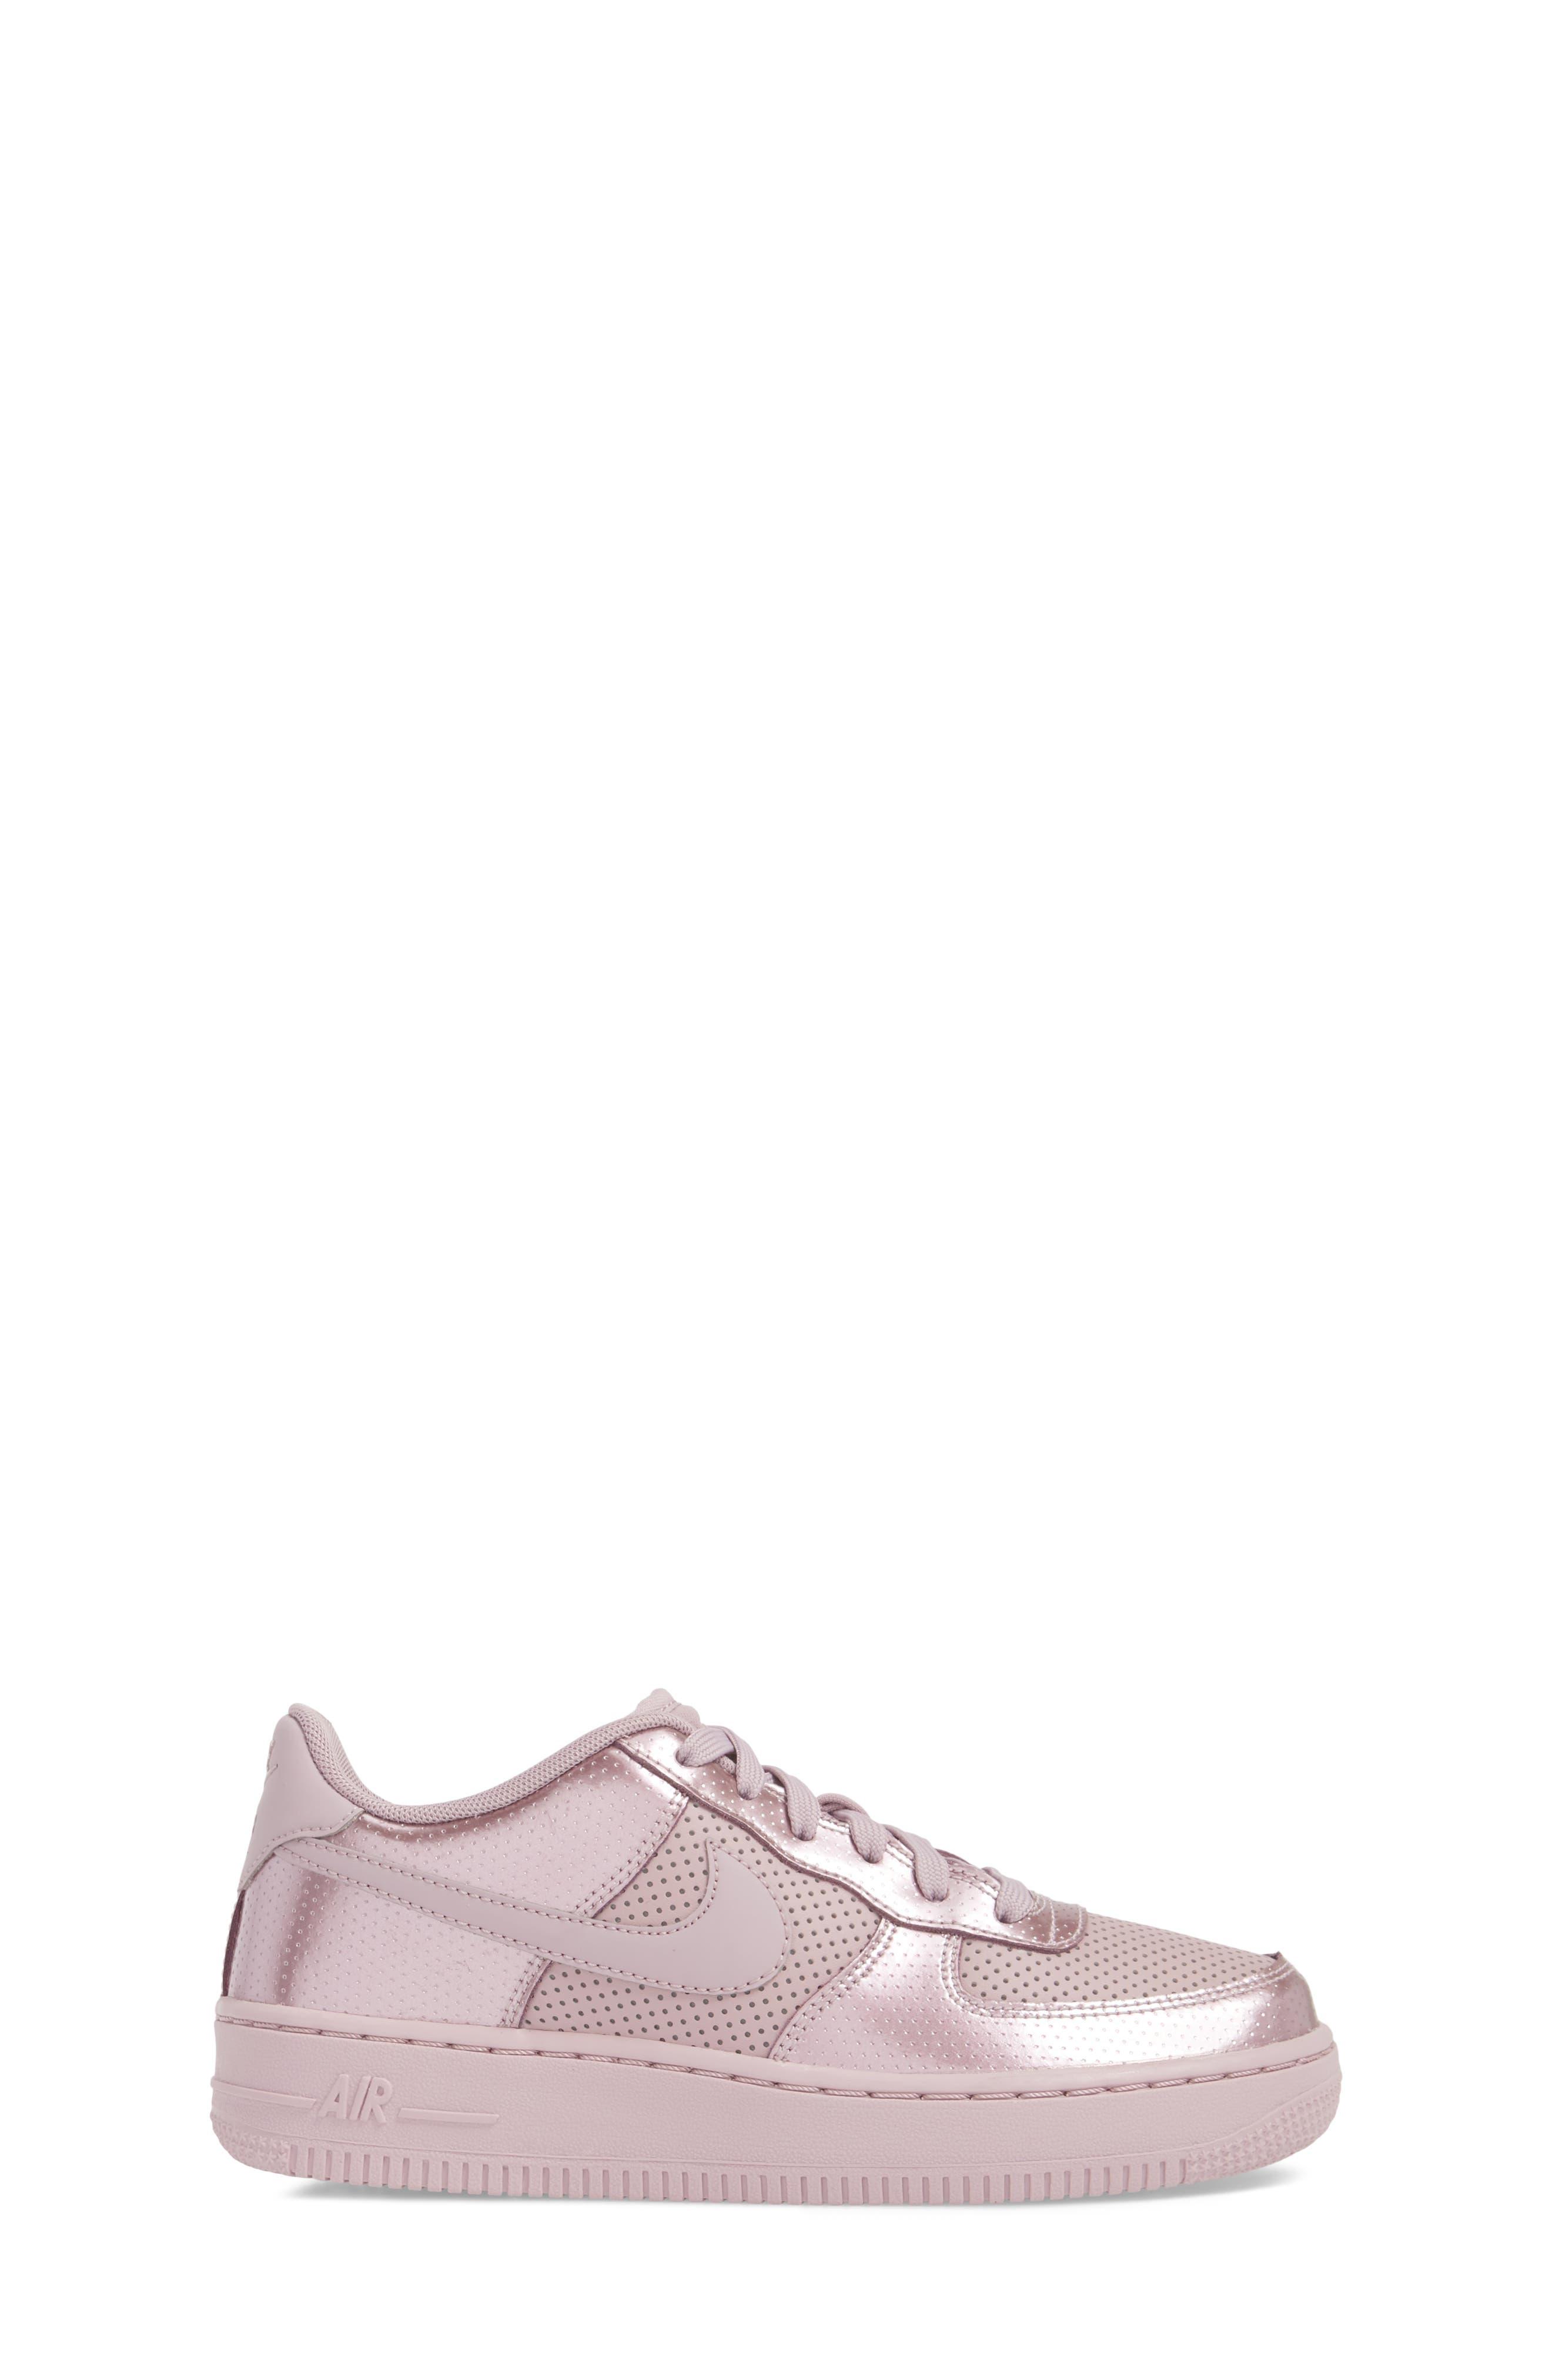 Air Force 1 LV8 Sneaker,                             Alternate thumbnail 14, color,